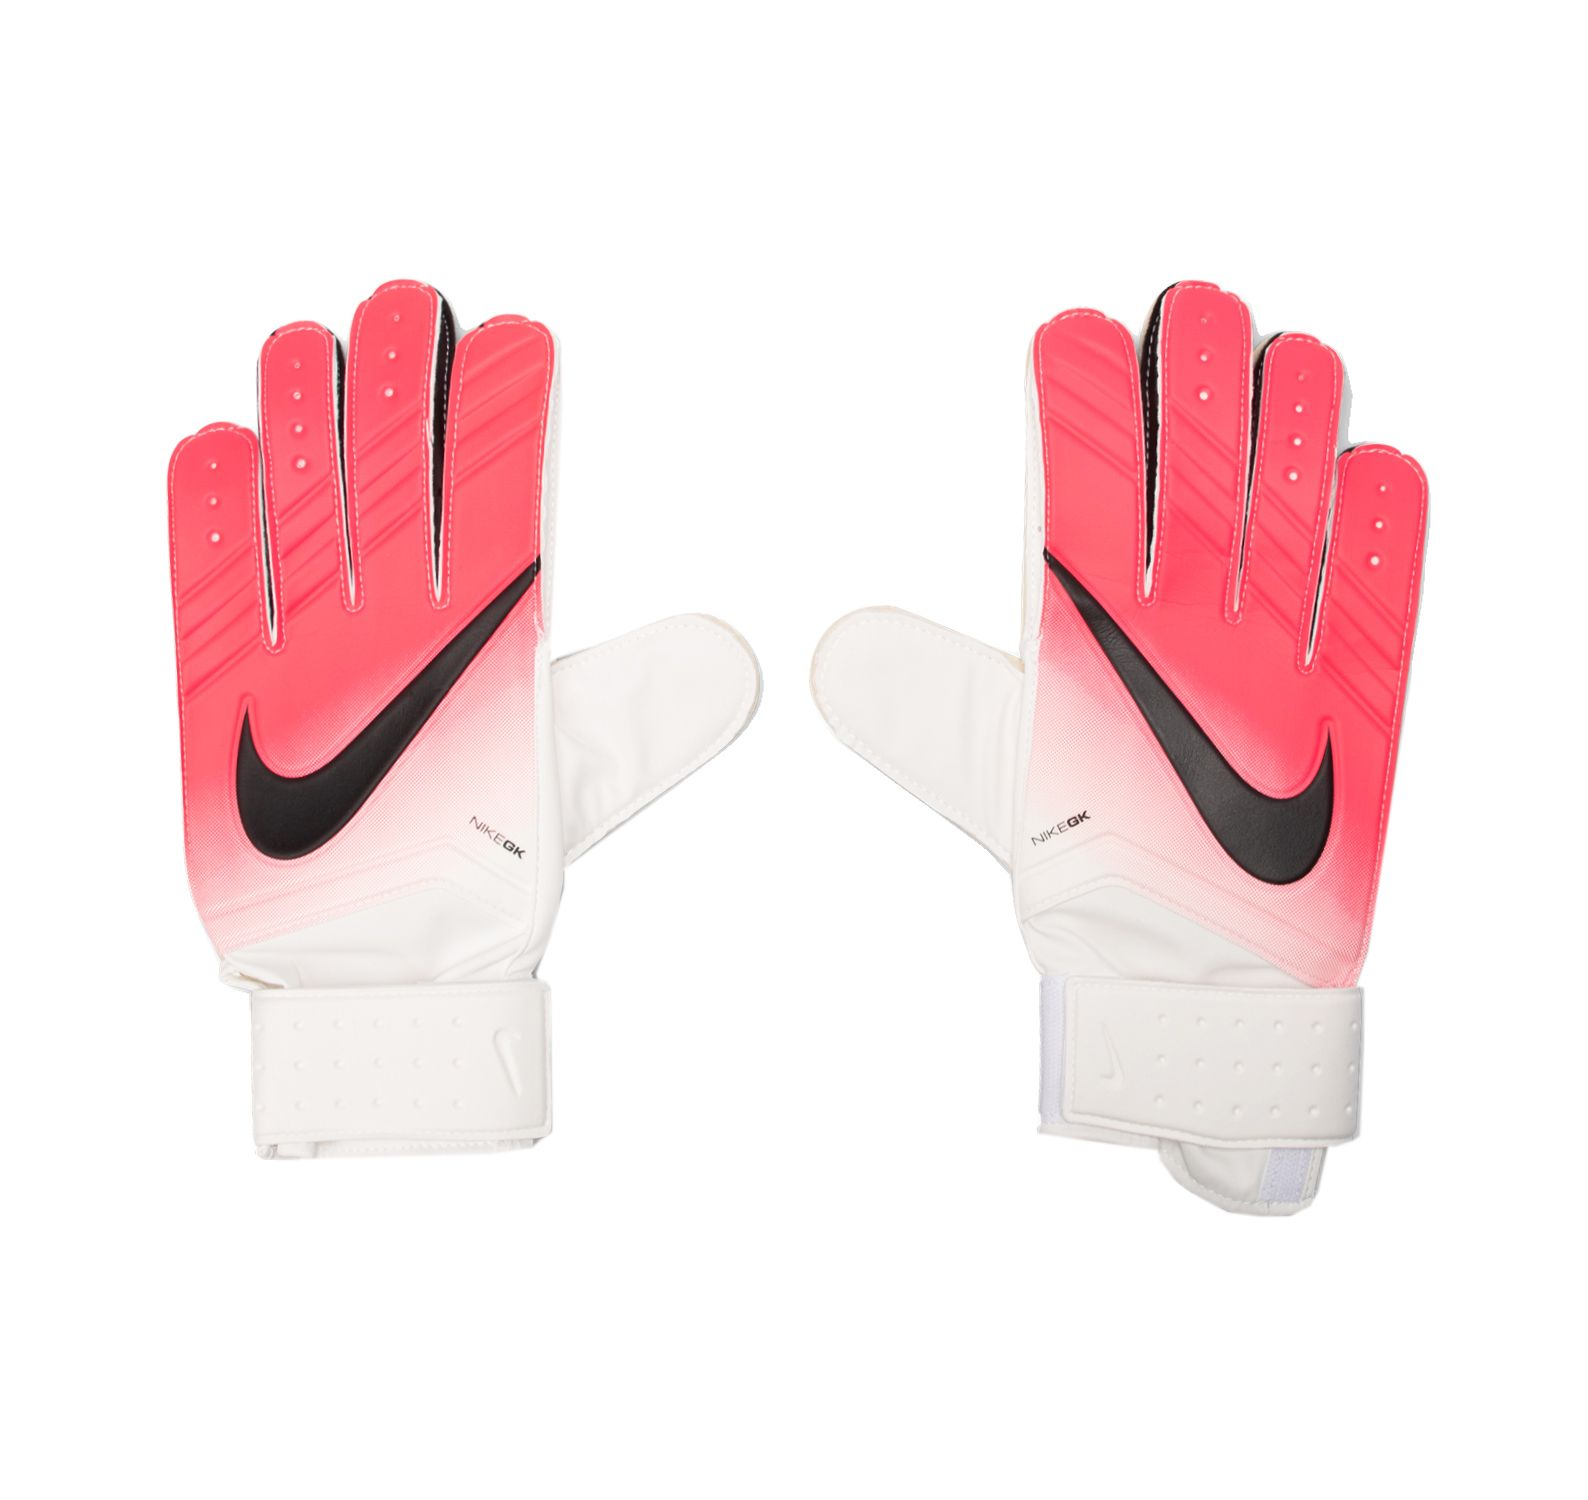 Nike Gk Match Fa16, White/Racer Pink/Black, 10,  Nike